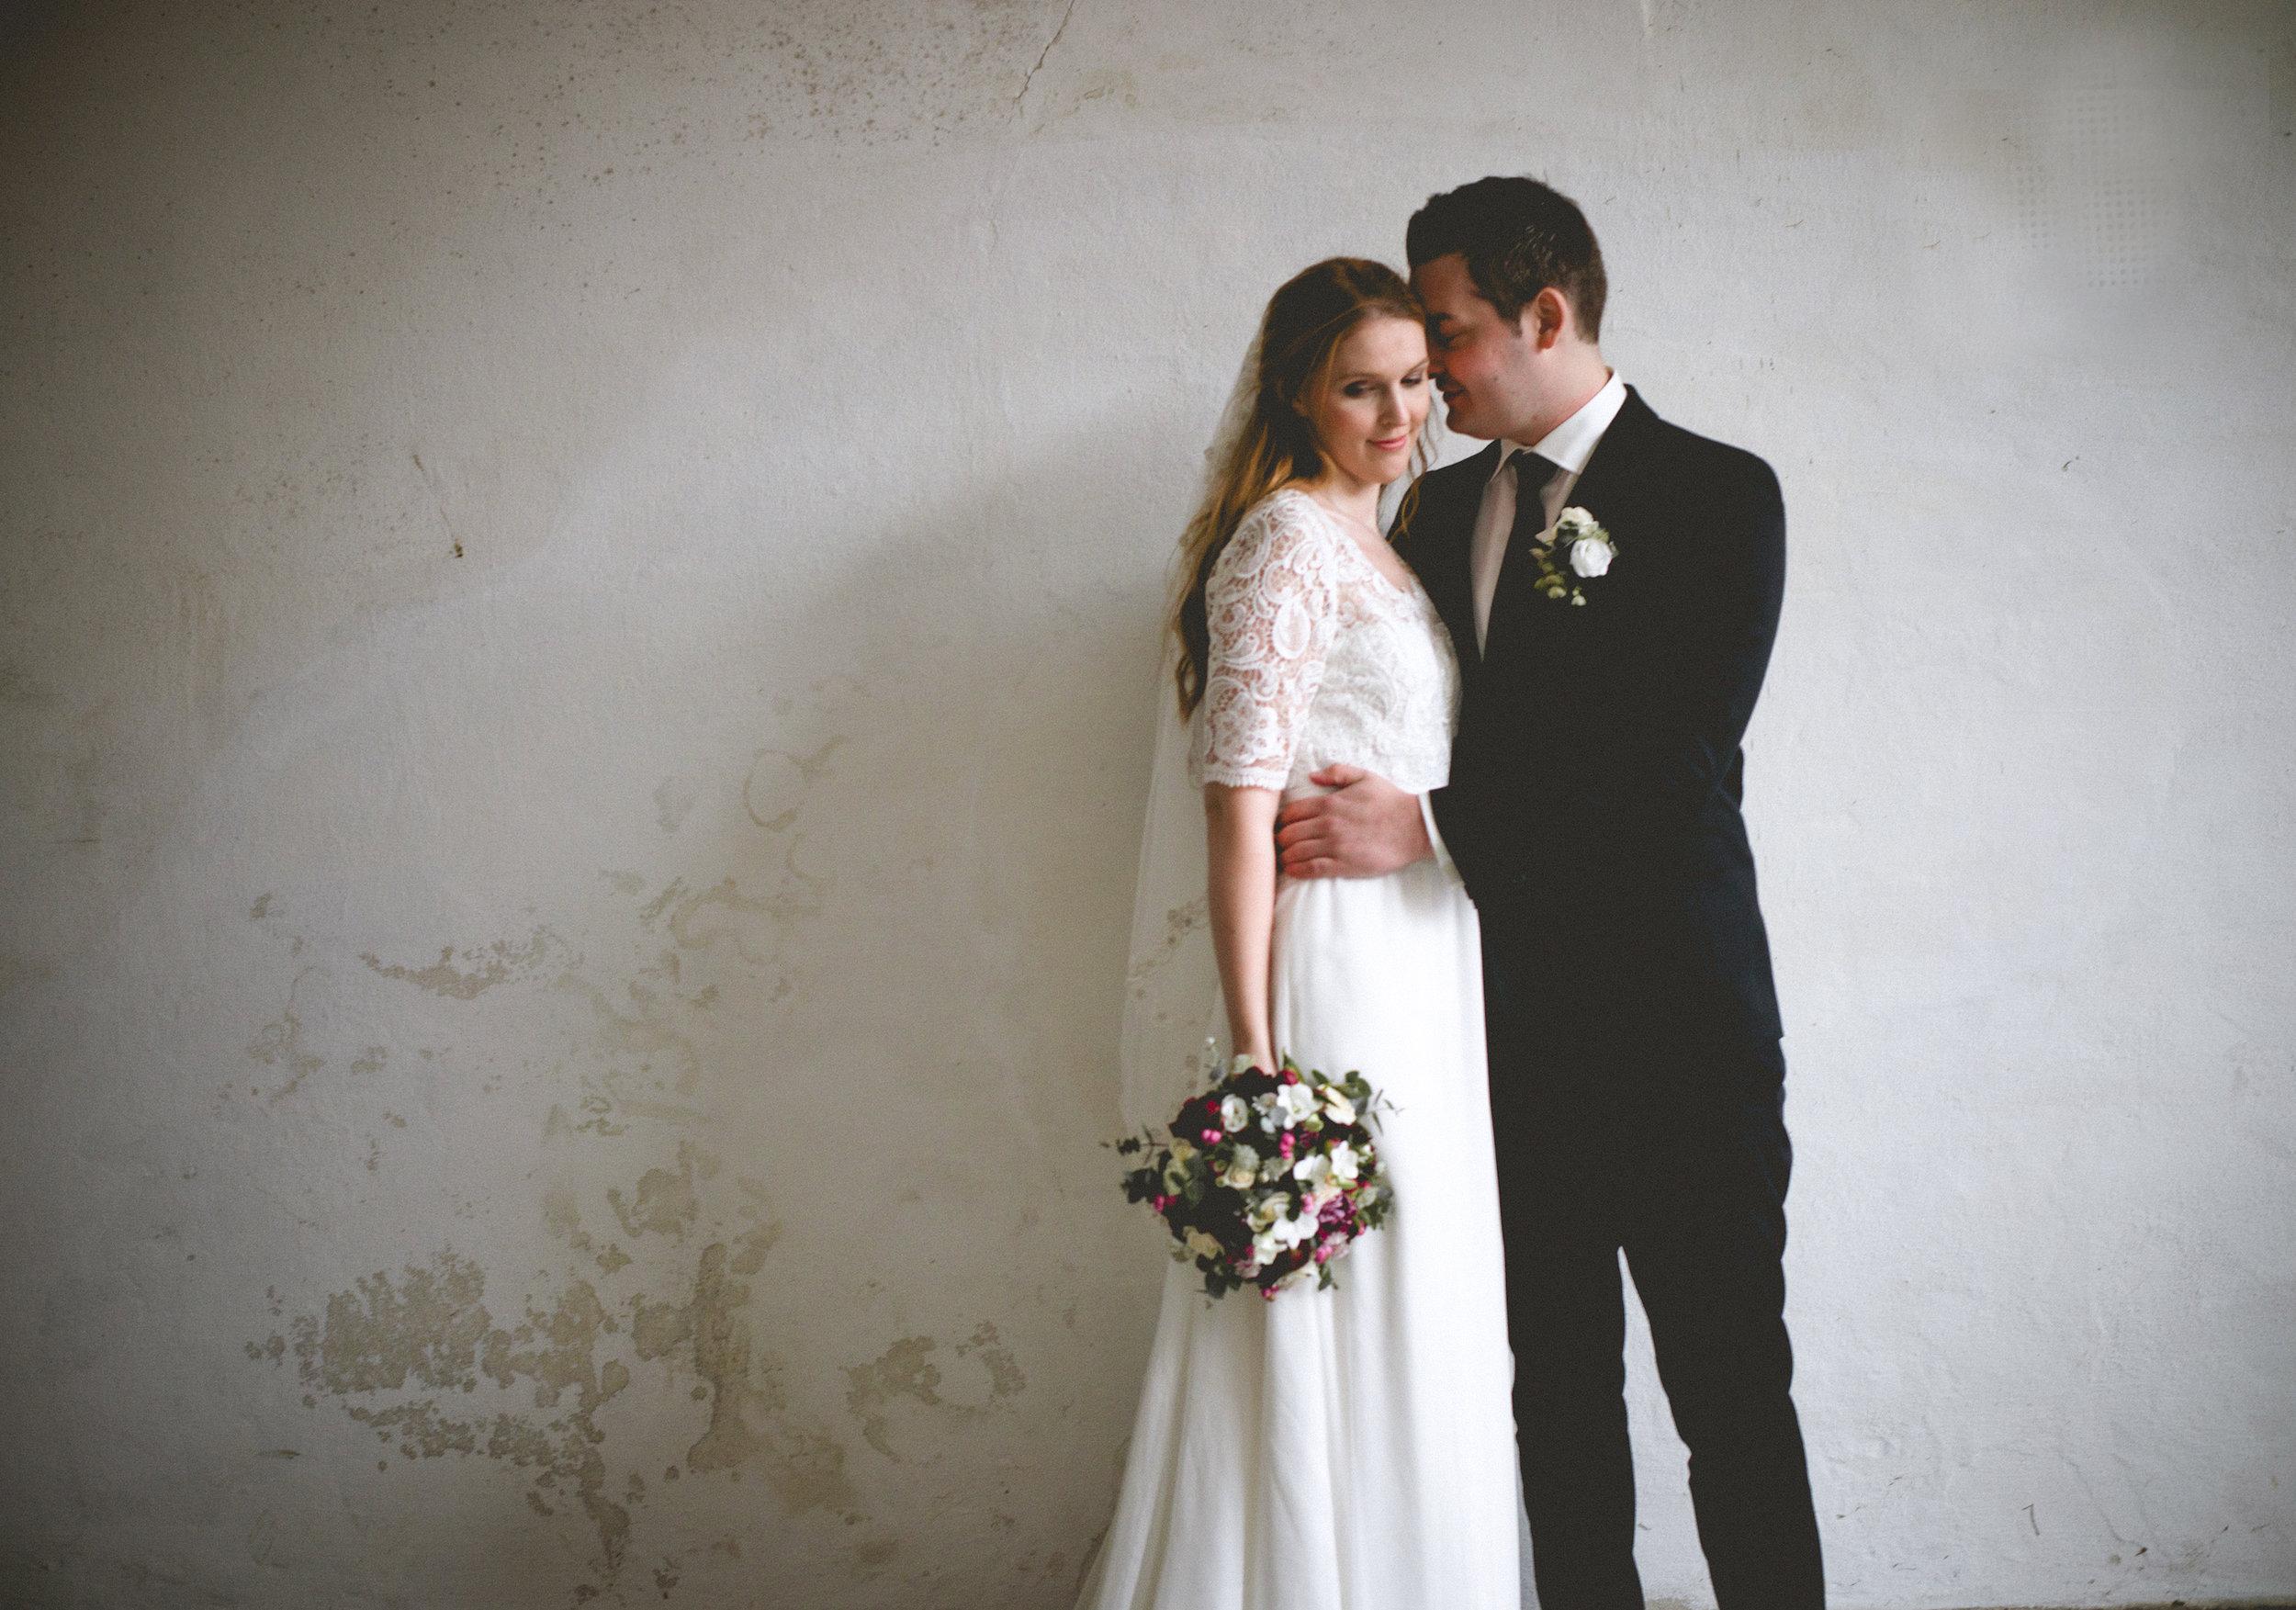 Georgina Ontario Wedding Photographer - Bride + Groom-70.jpg